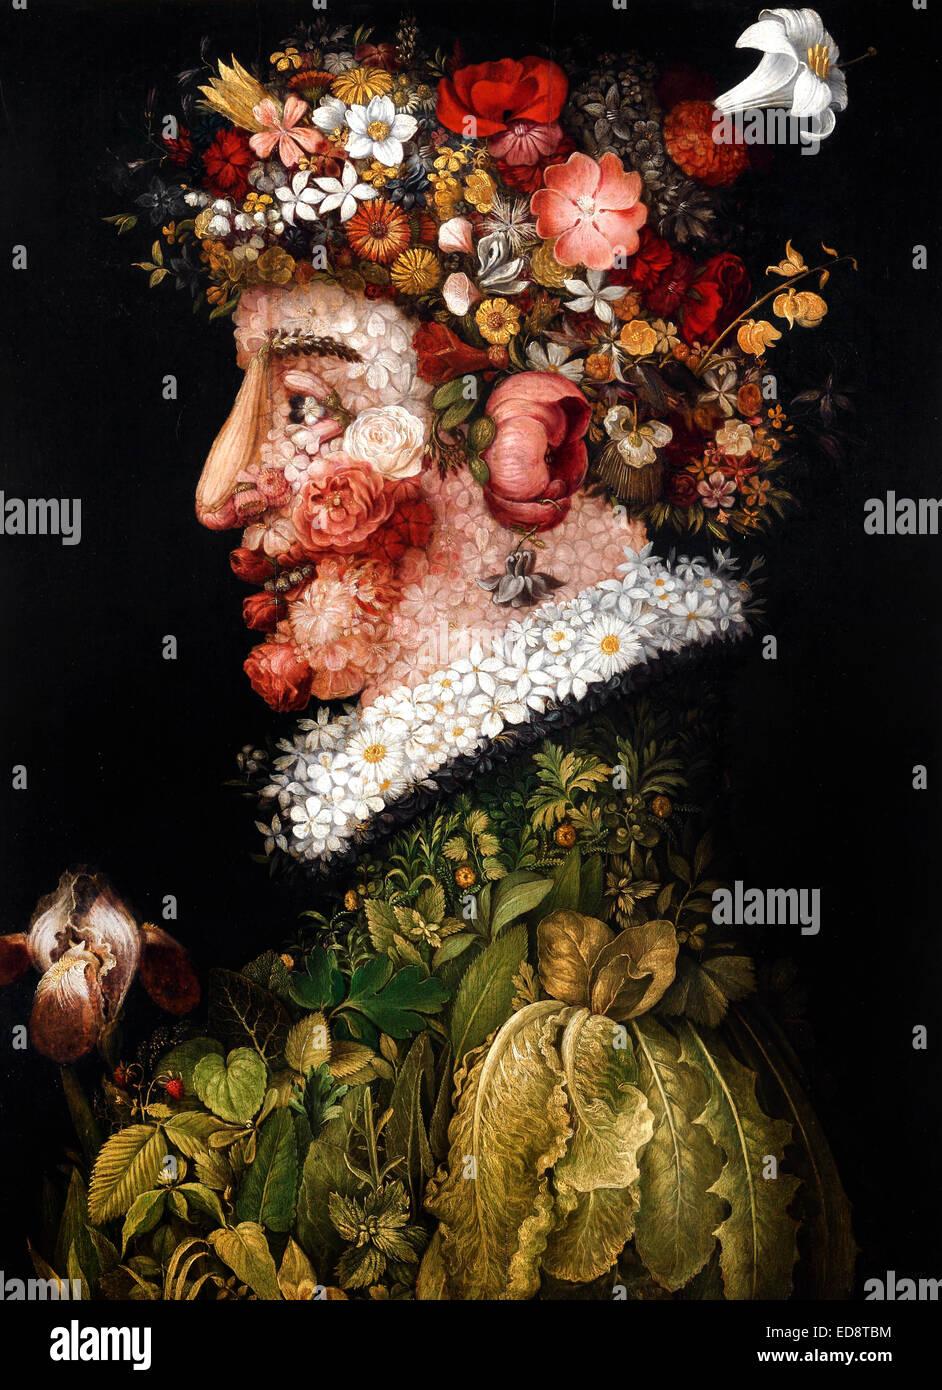 Giuseppe Arcimboldo, La Primavera (Spring) 1563 Real Academia de Bellas Artes de San Fernando, Madrid, España. Foto de stock